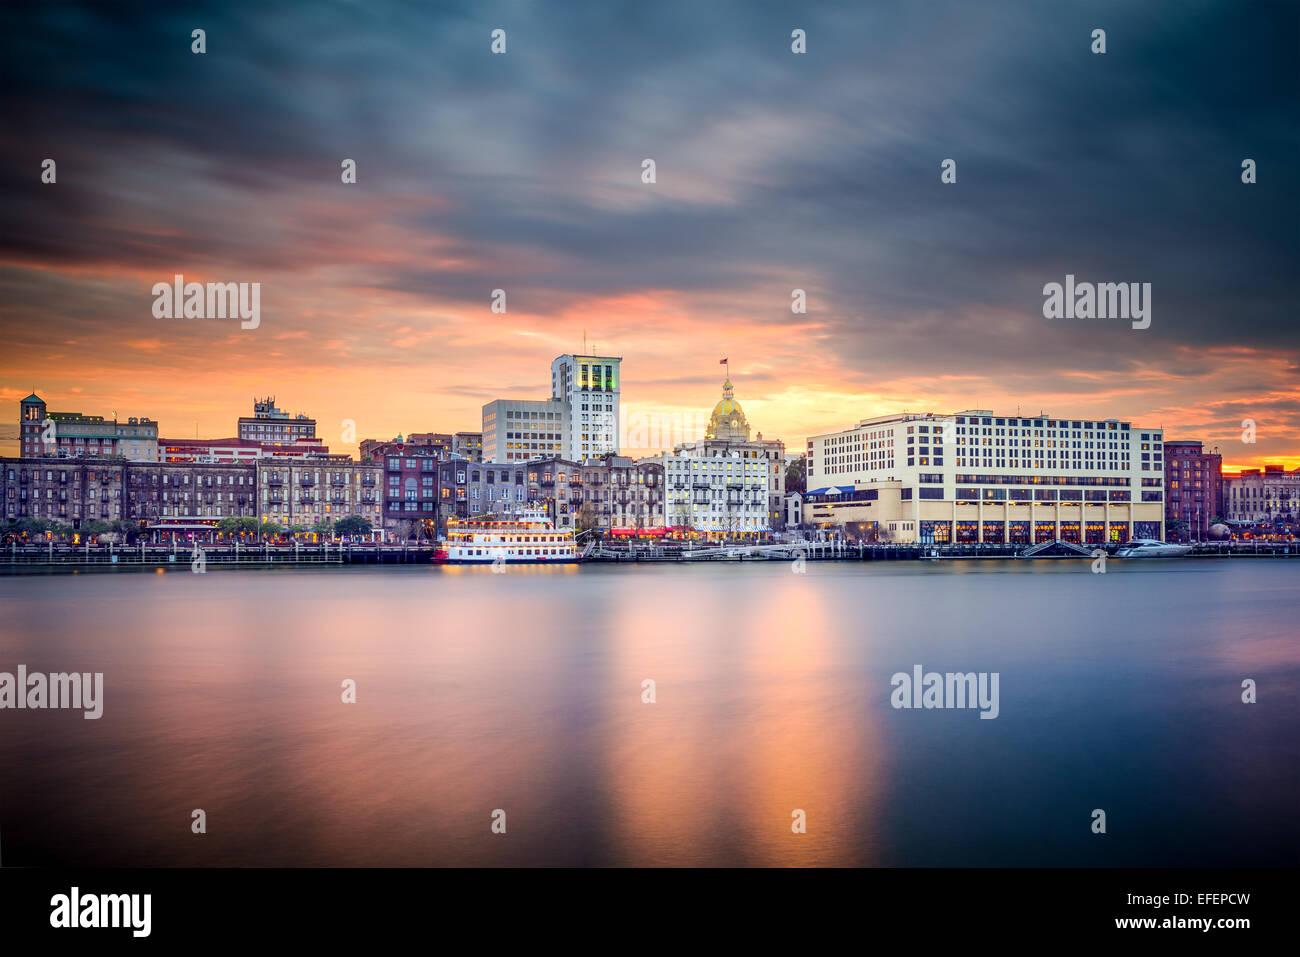 Savannah, Georgia, EE.UU riverfront skyline. Imagen De Stock